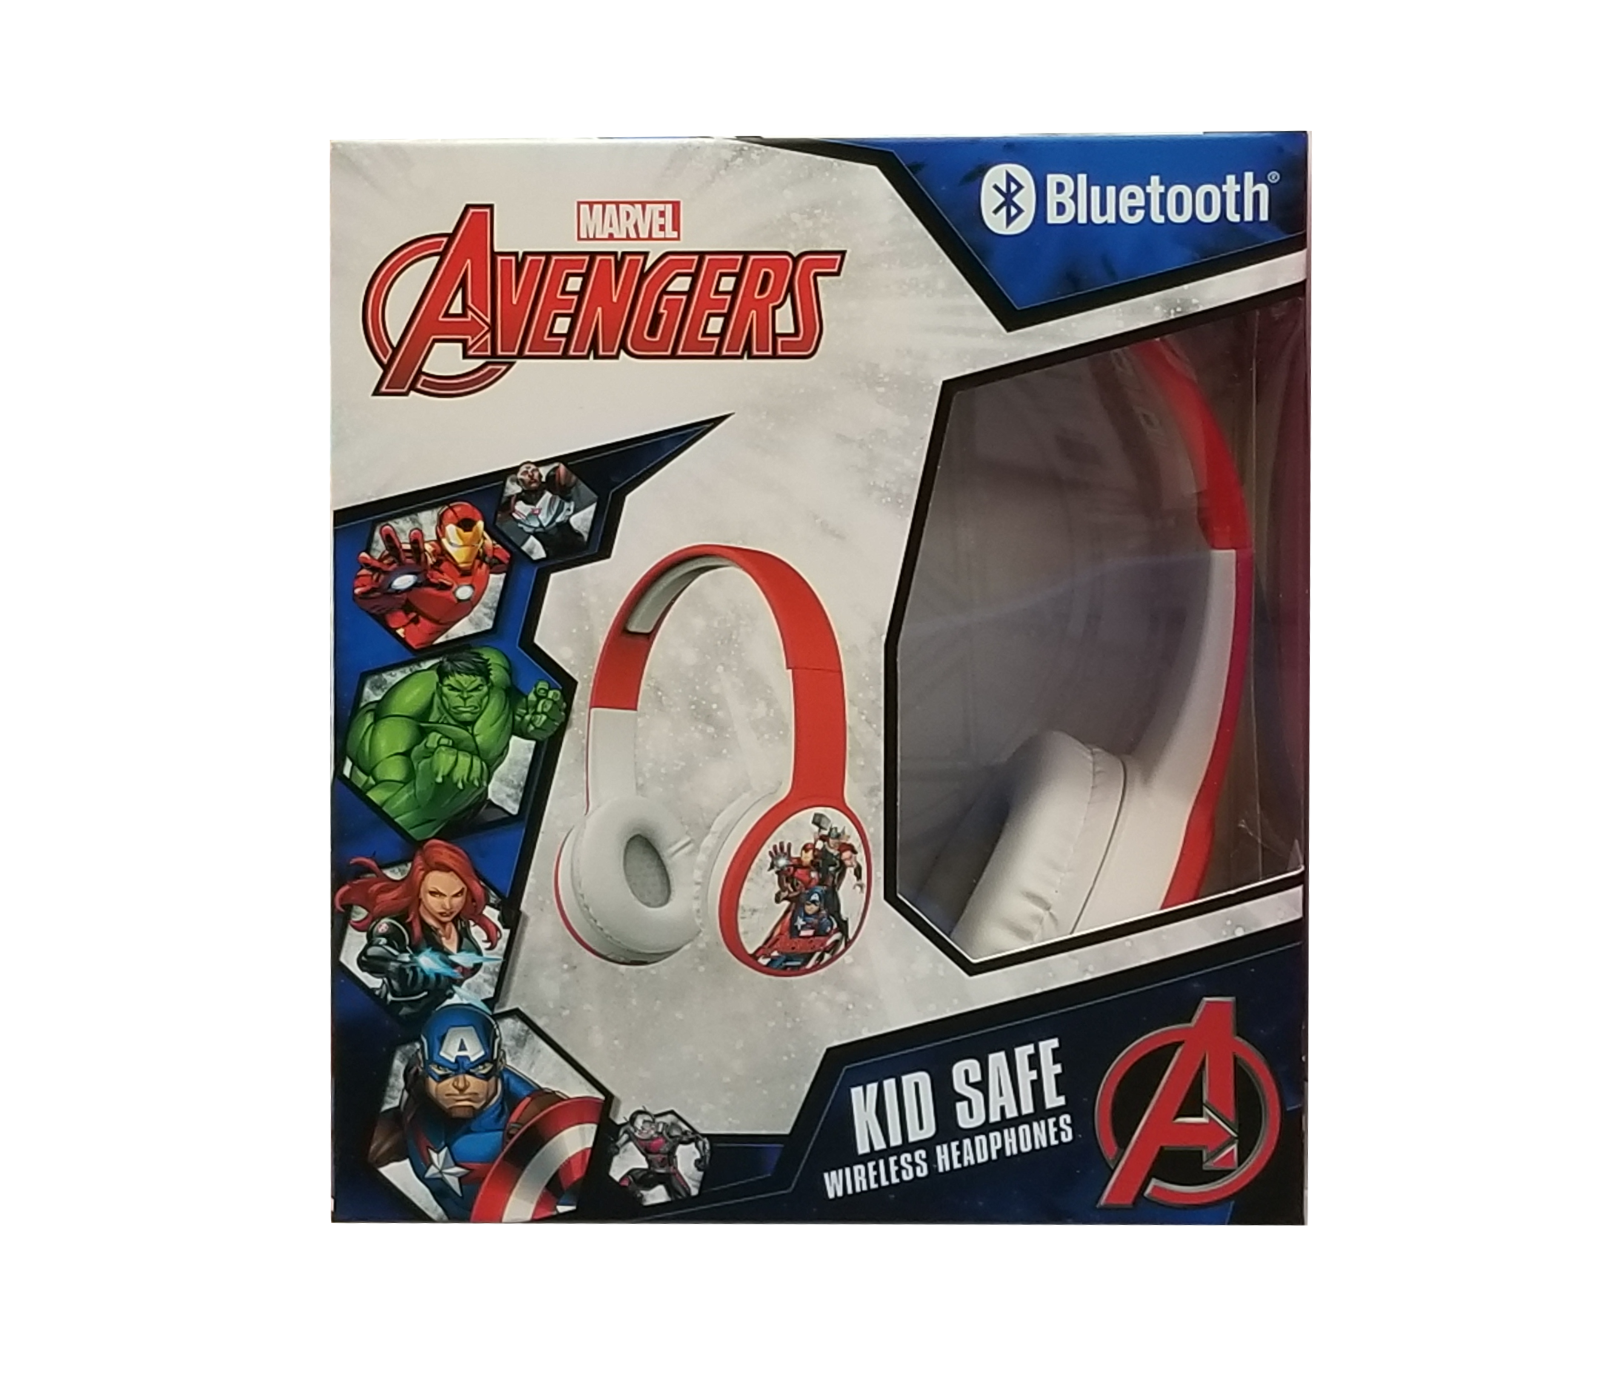 Marvel Avengers Bluetooth Kid Safe Wireless Headphones (HP-0063-BT AVENGERS)